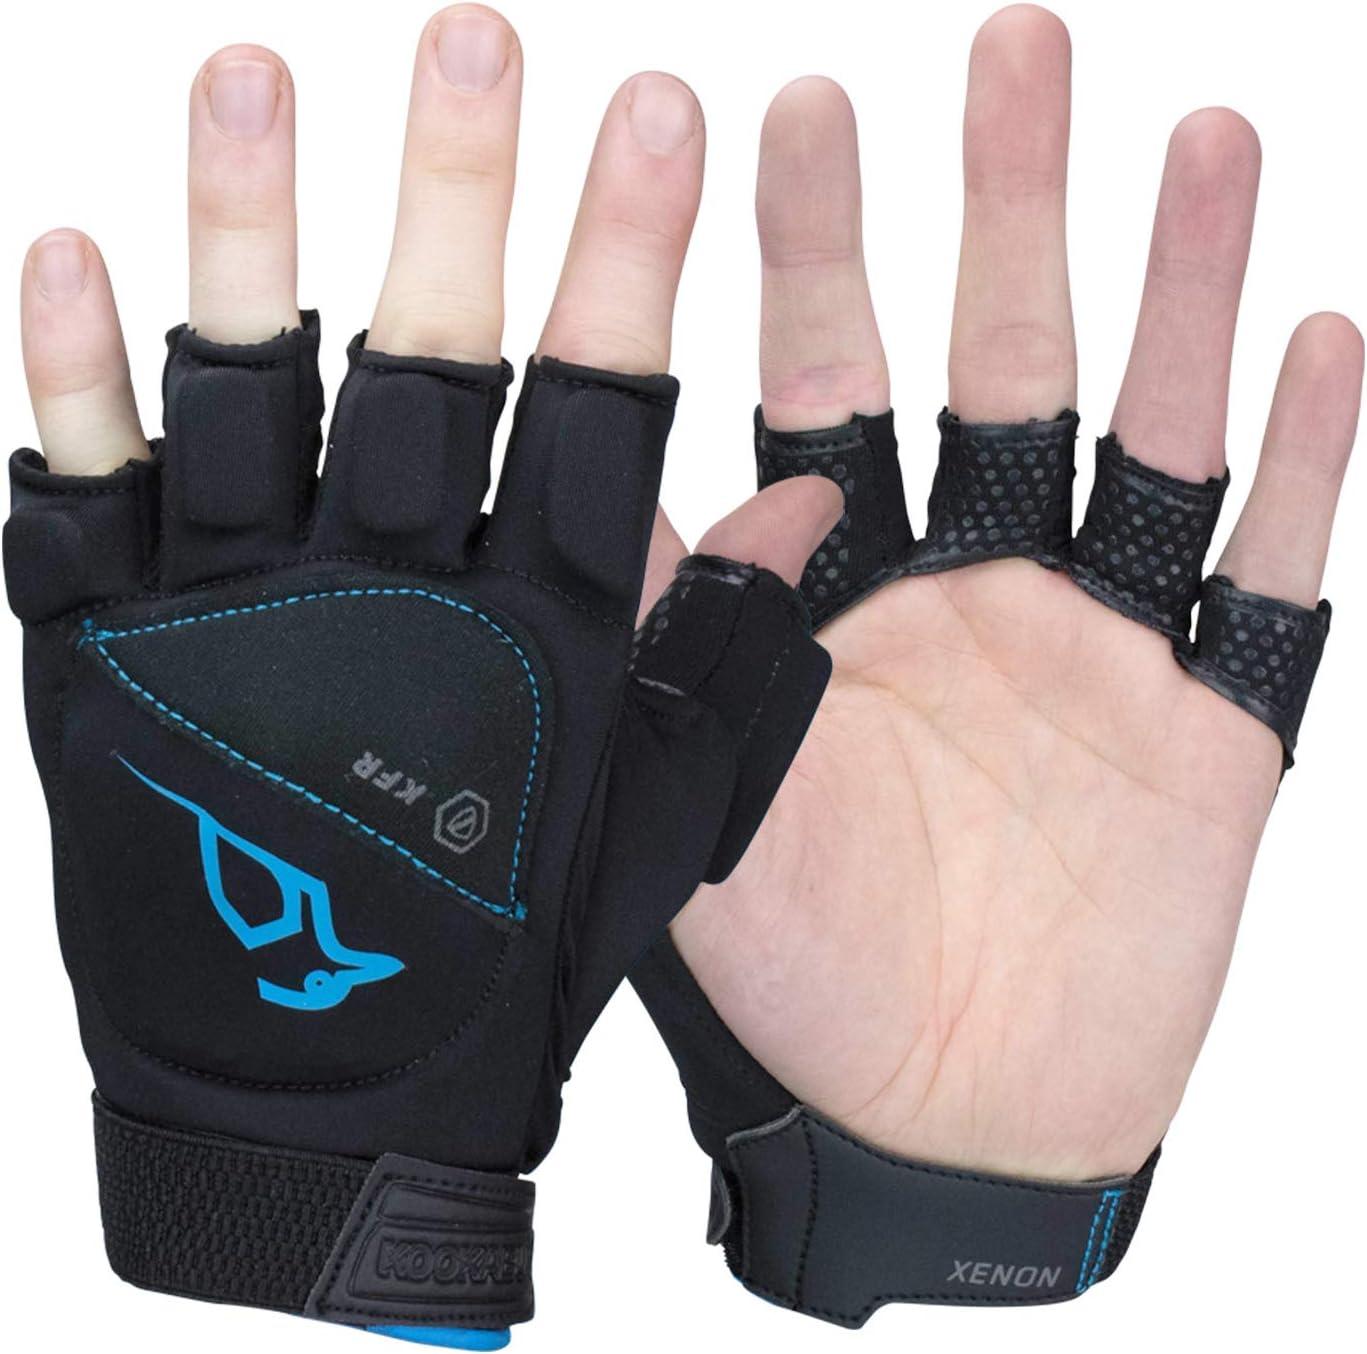 Black KOOKABURRA Unisexs Xenon Hockey Handguards Medium Left Hand